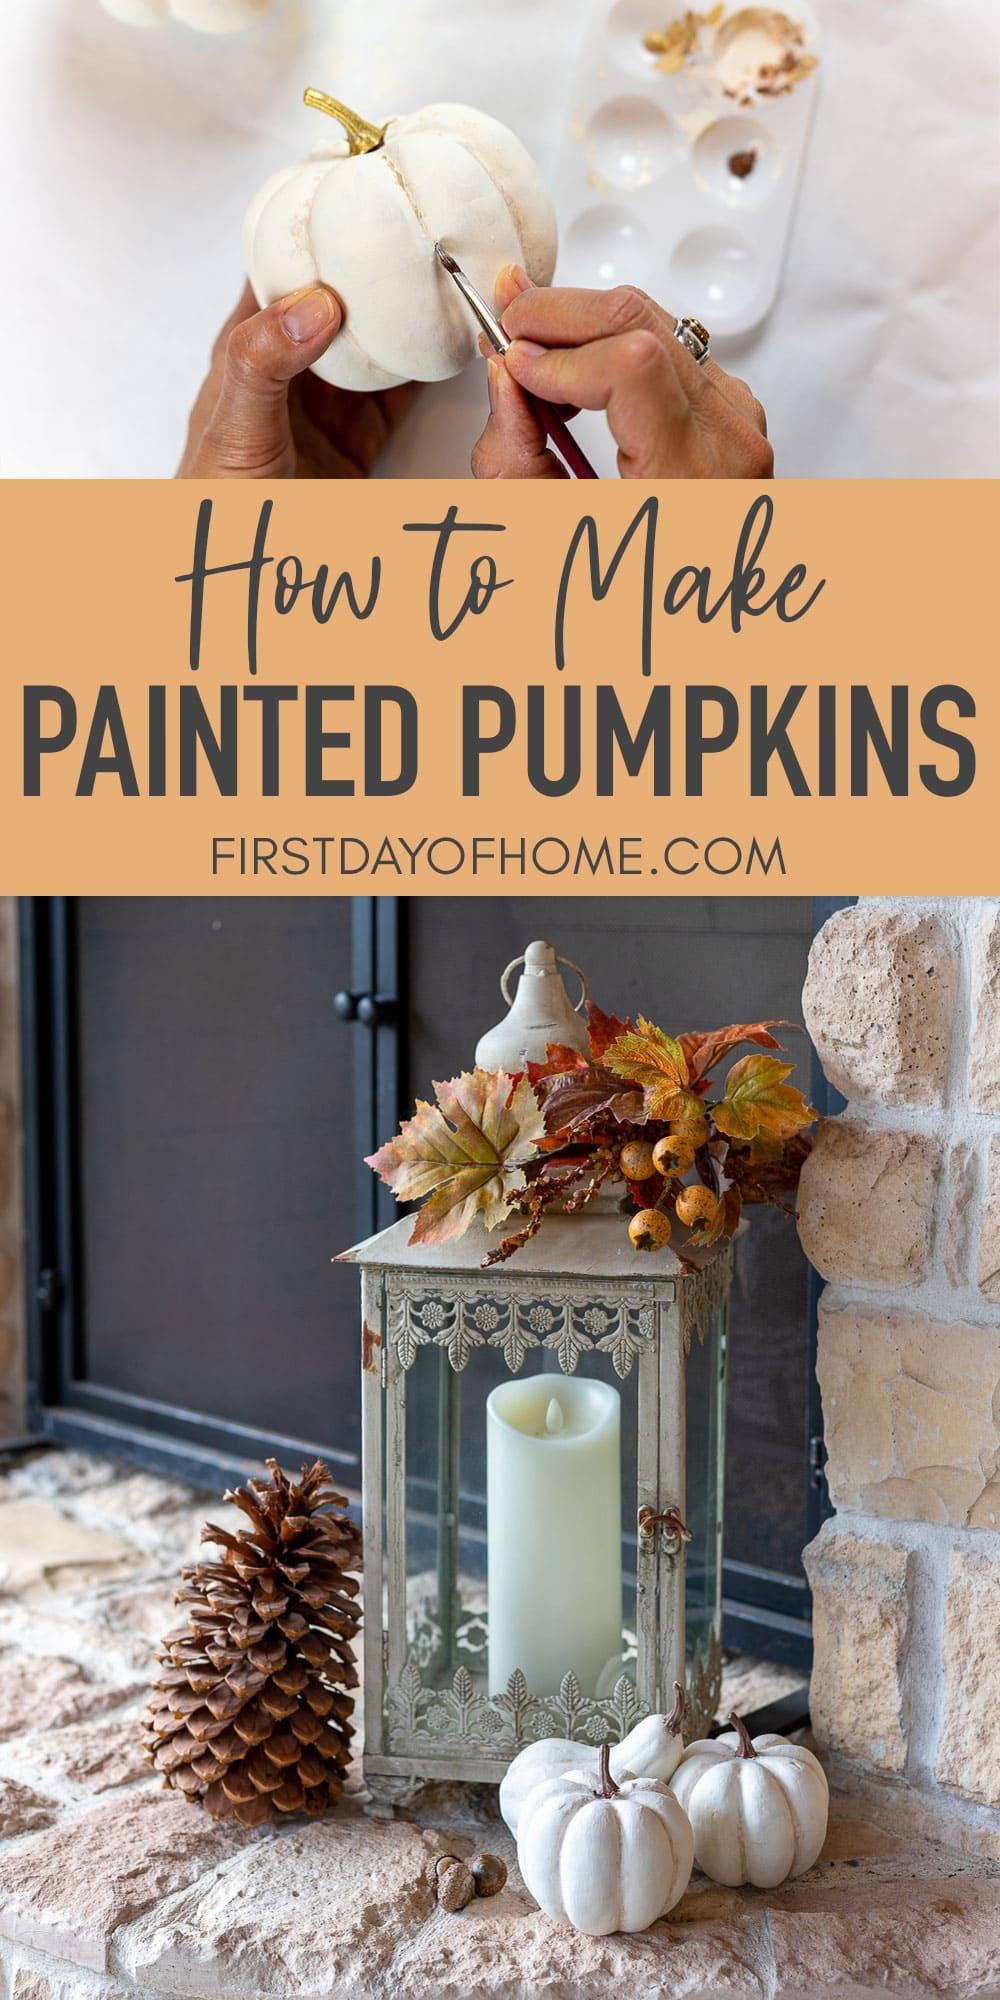 DIY painted pumpkin tutorial and decor